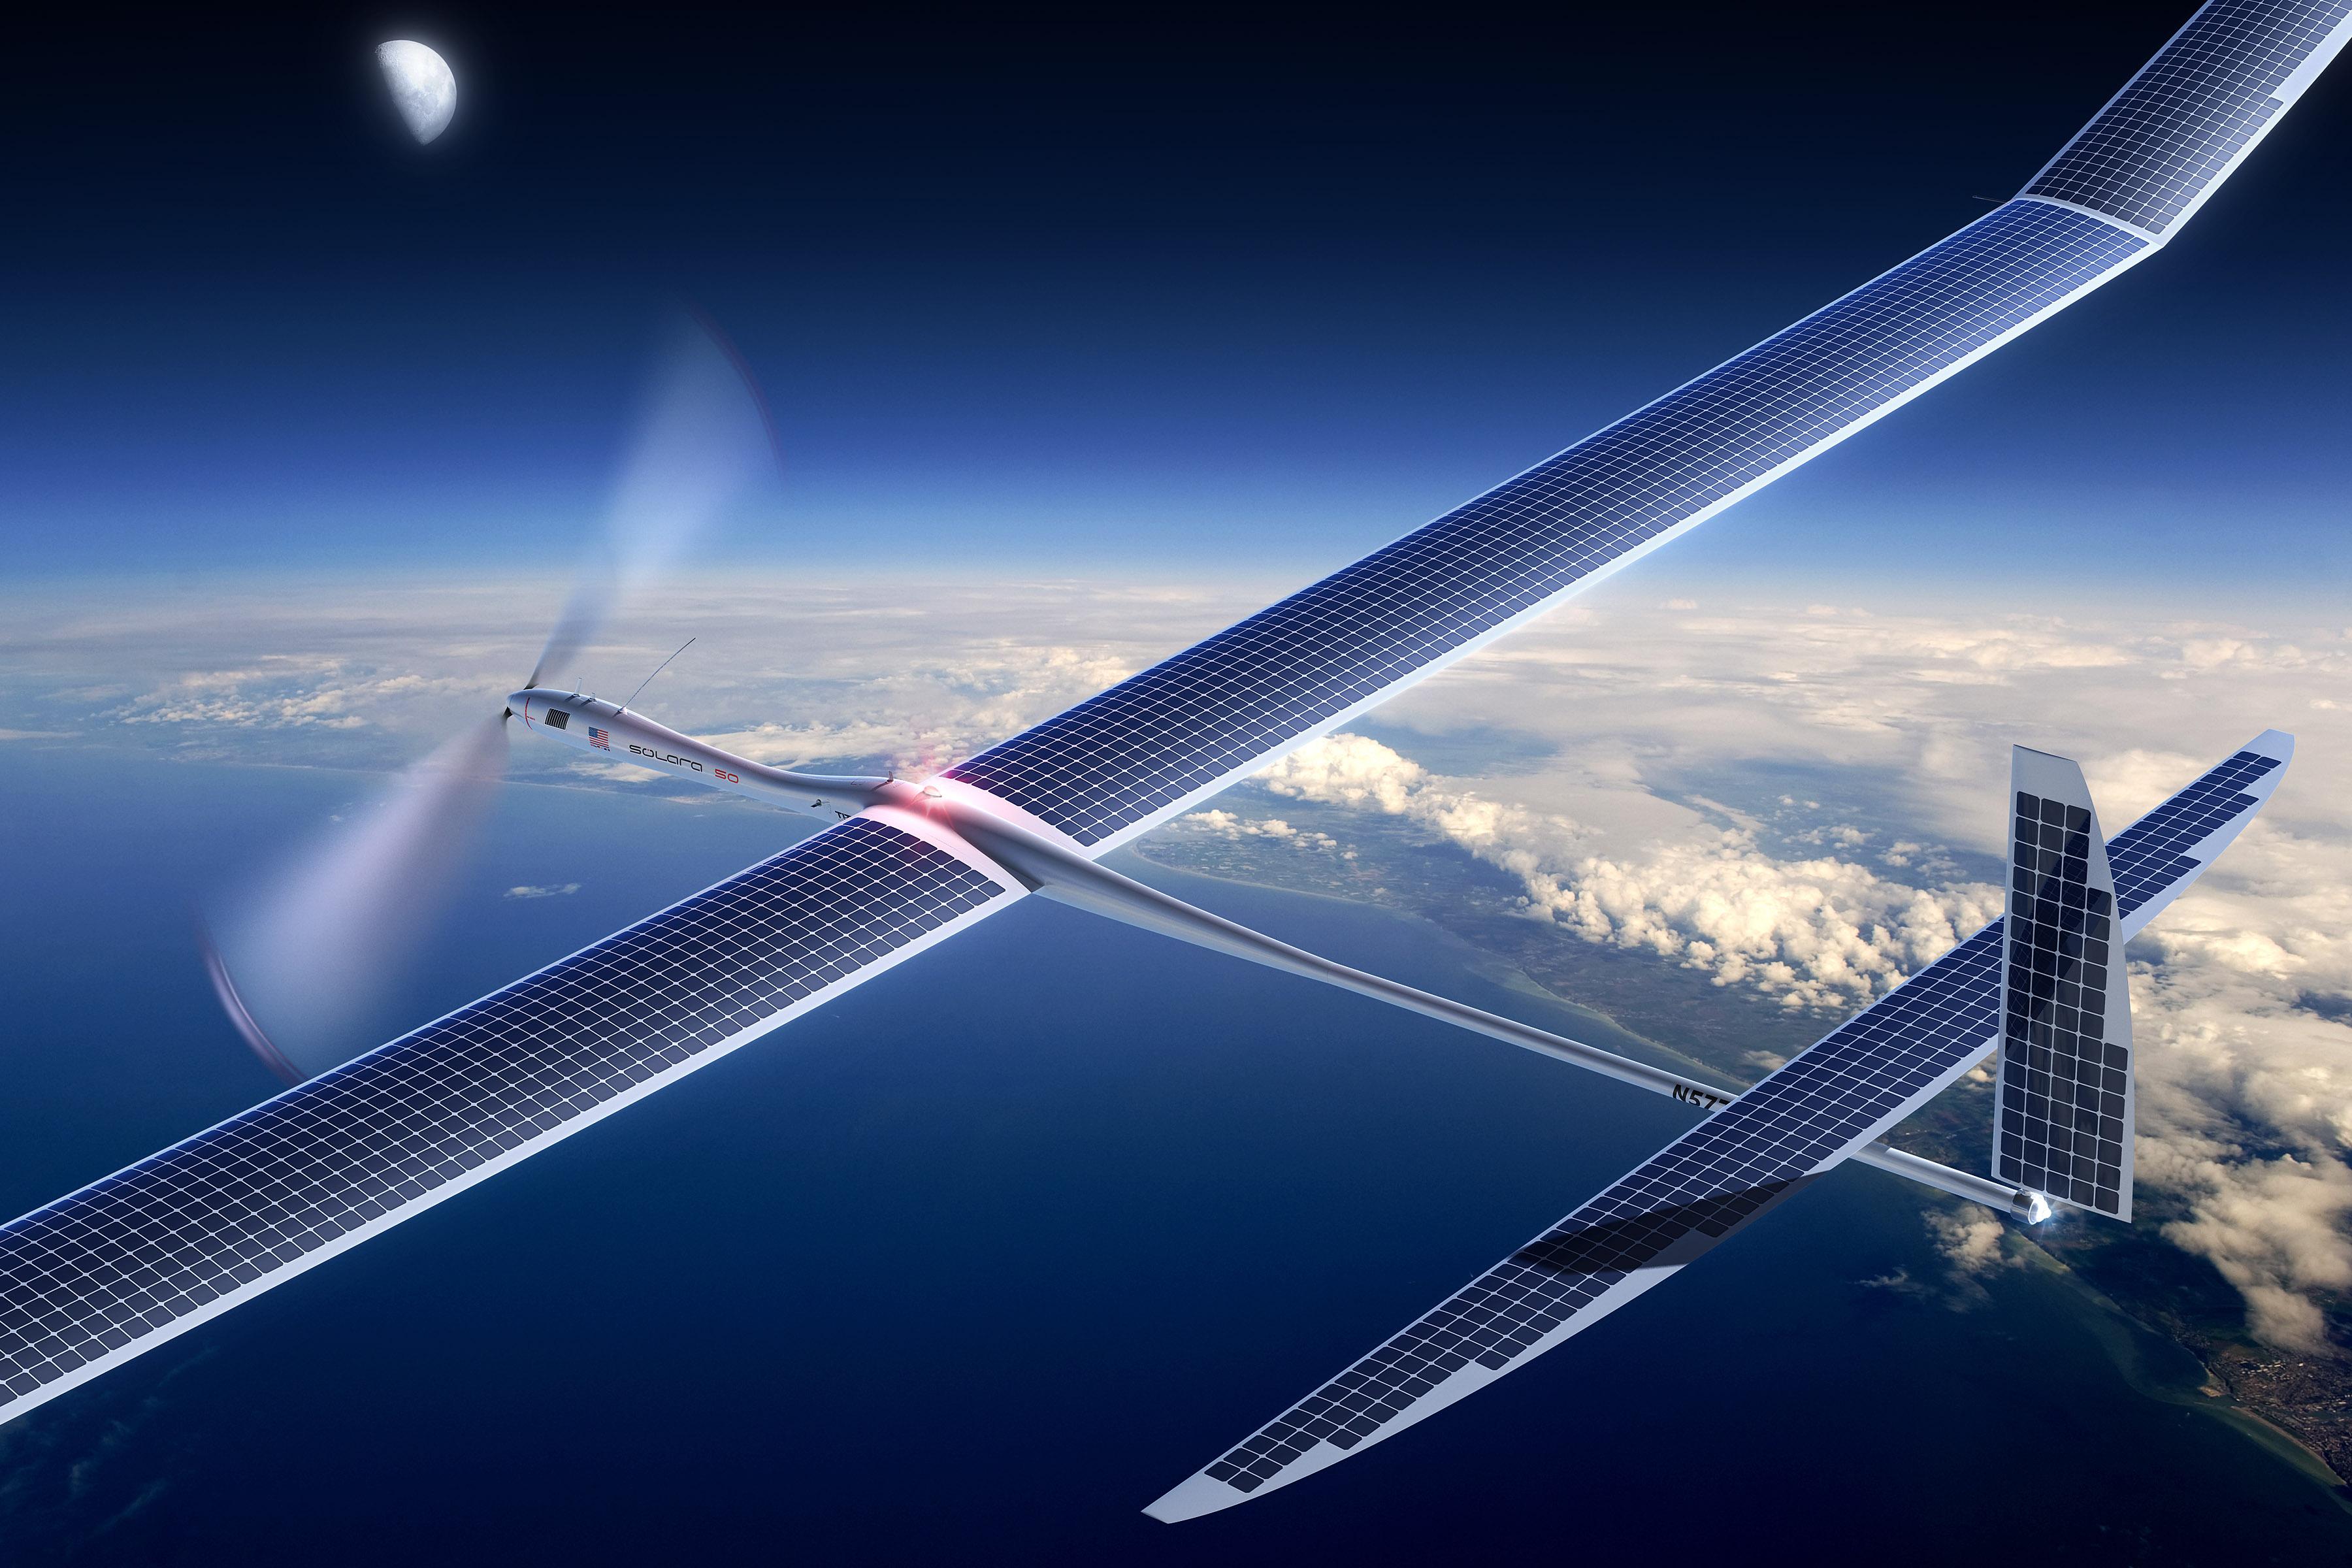 titan aerospace facebook drone